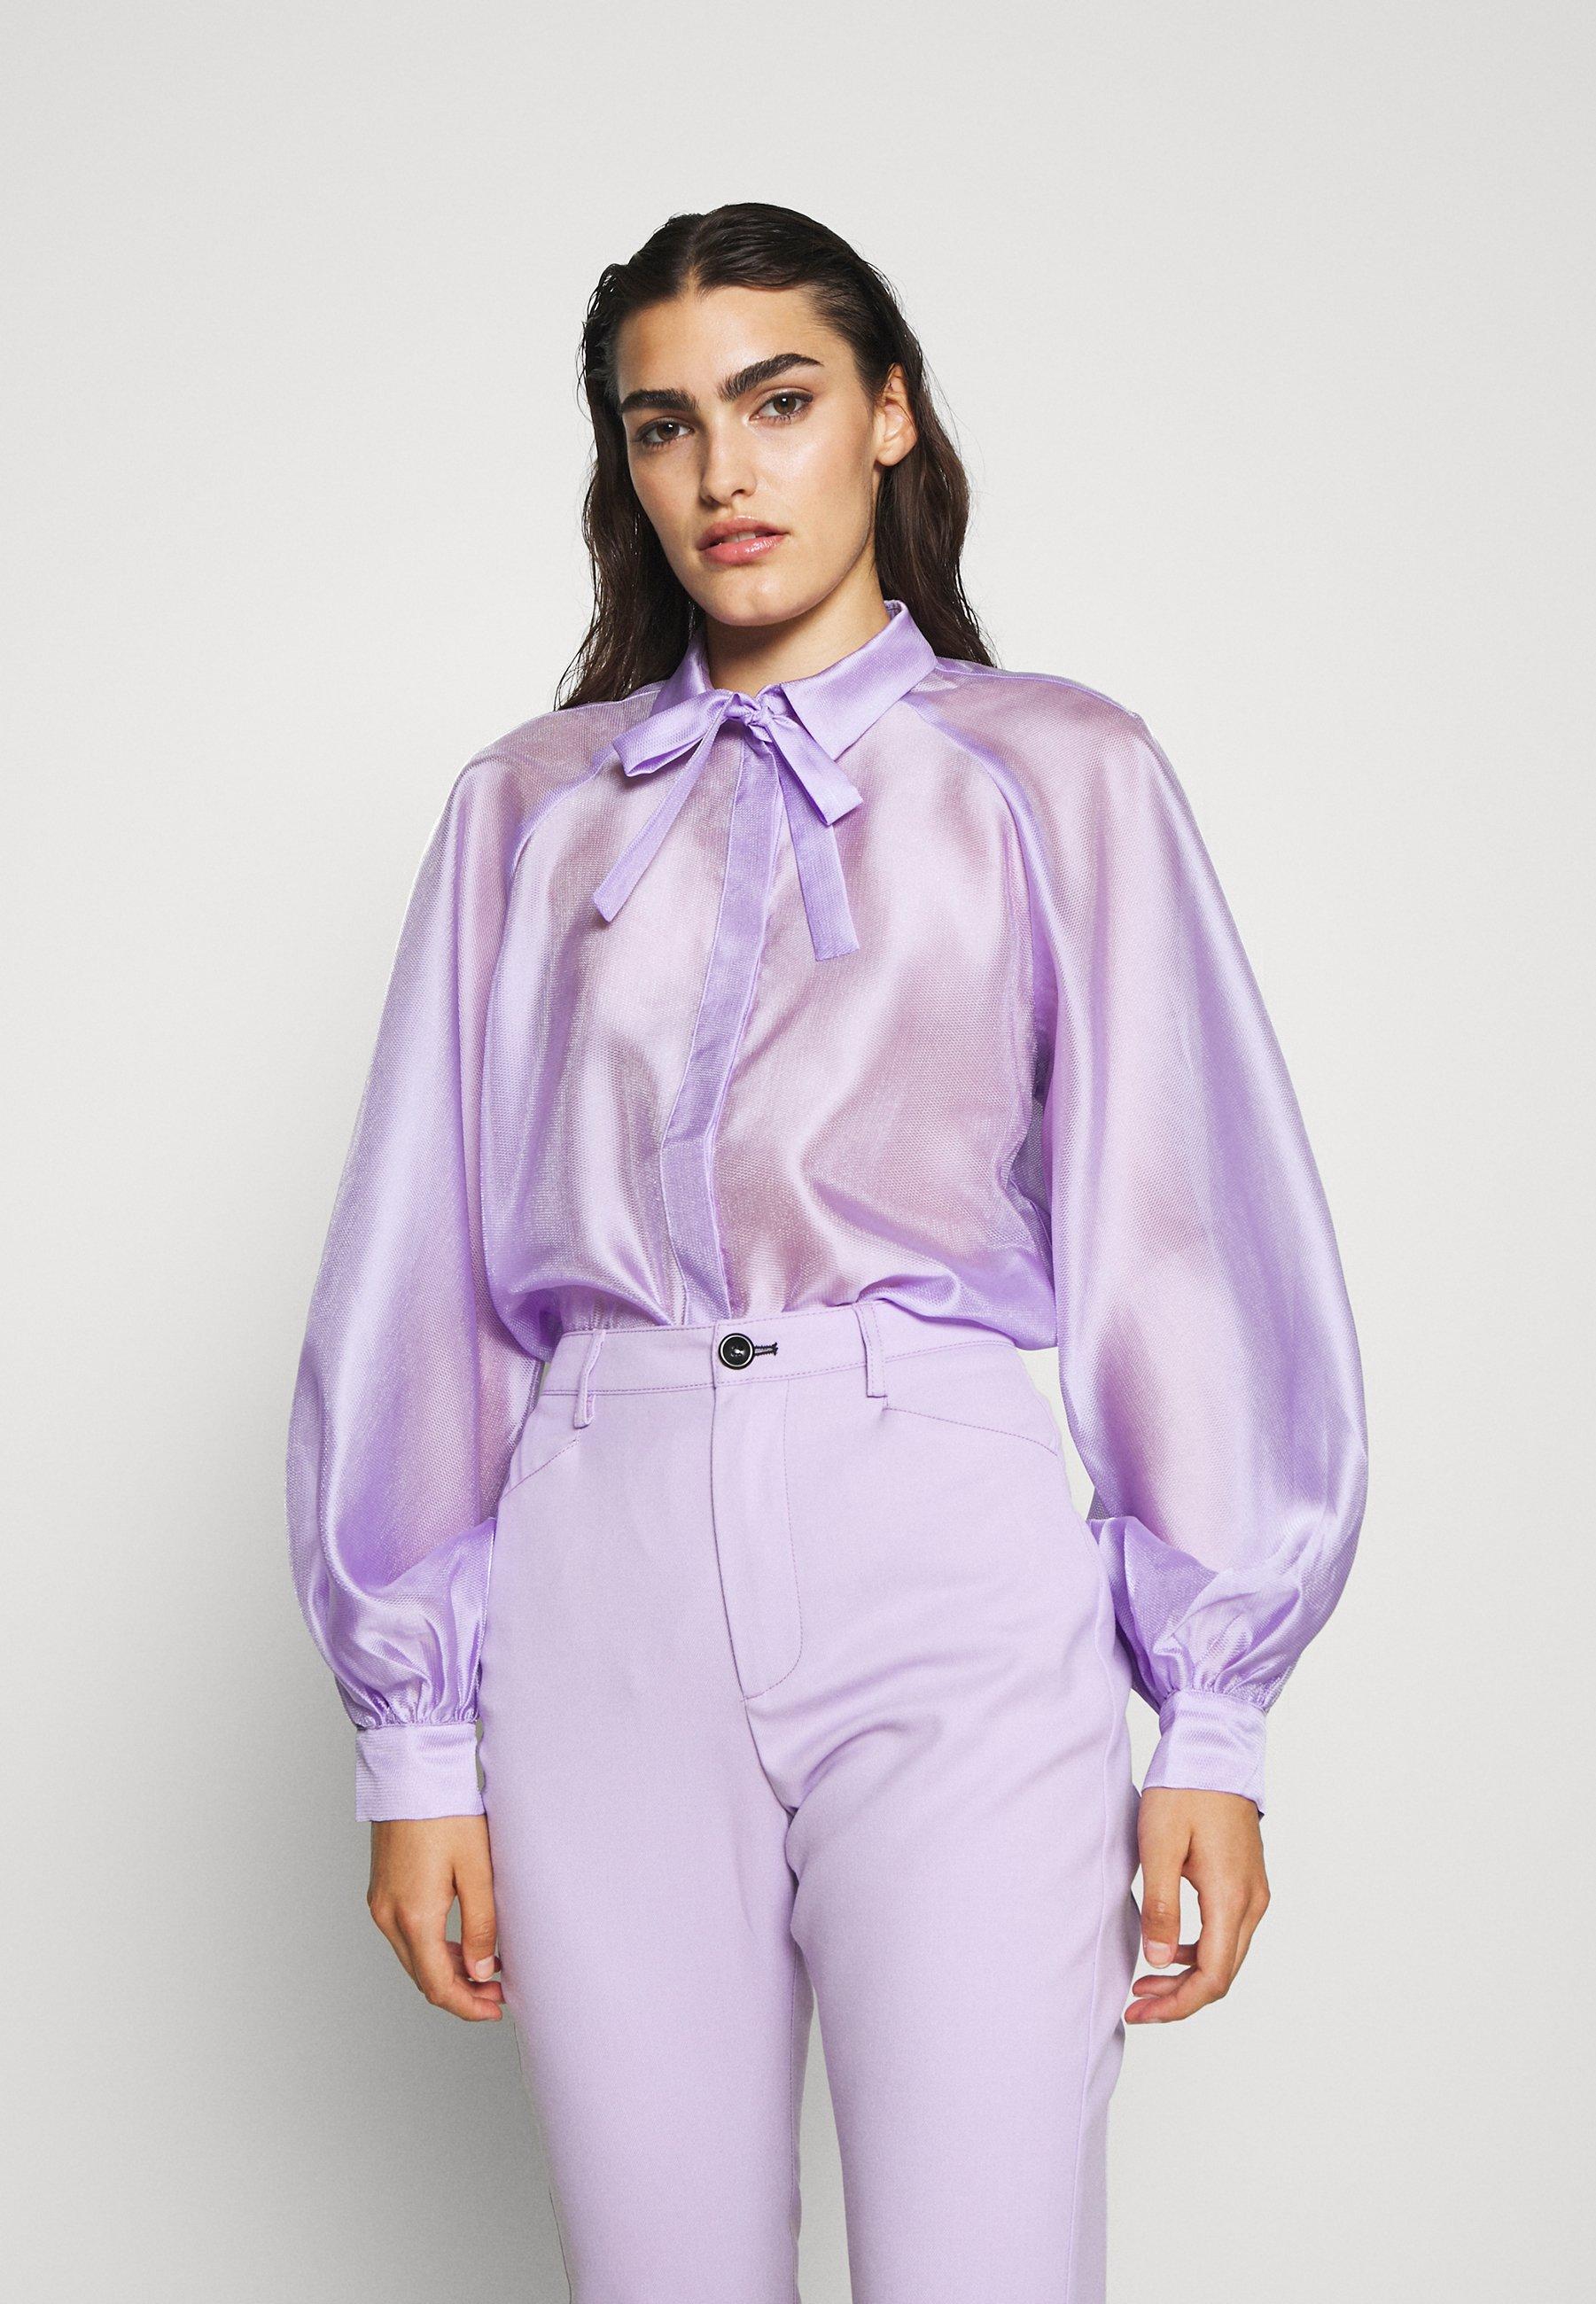 DESIGNERS REMIX ENOLA SLEEVE - Skjortebluser - lavender - Damer Bluser & tunikaer sDQ52